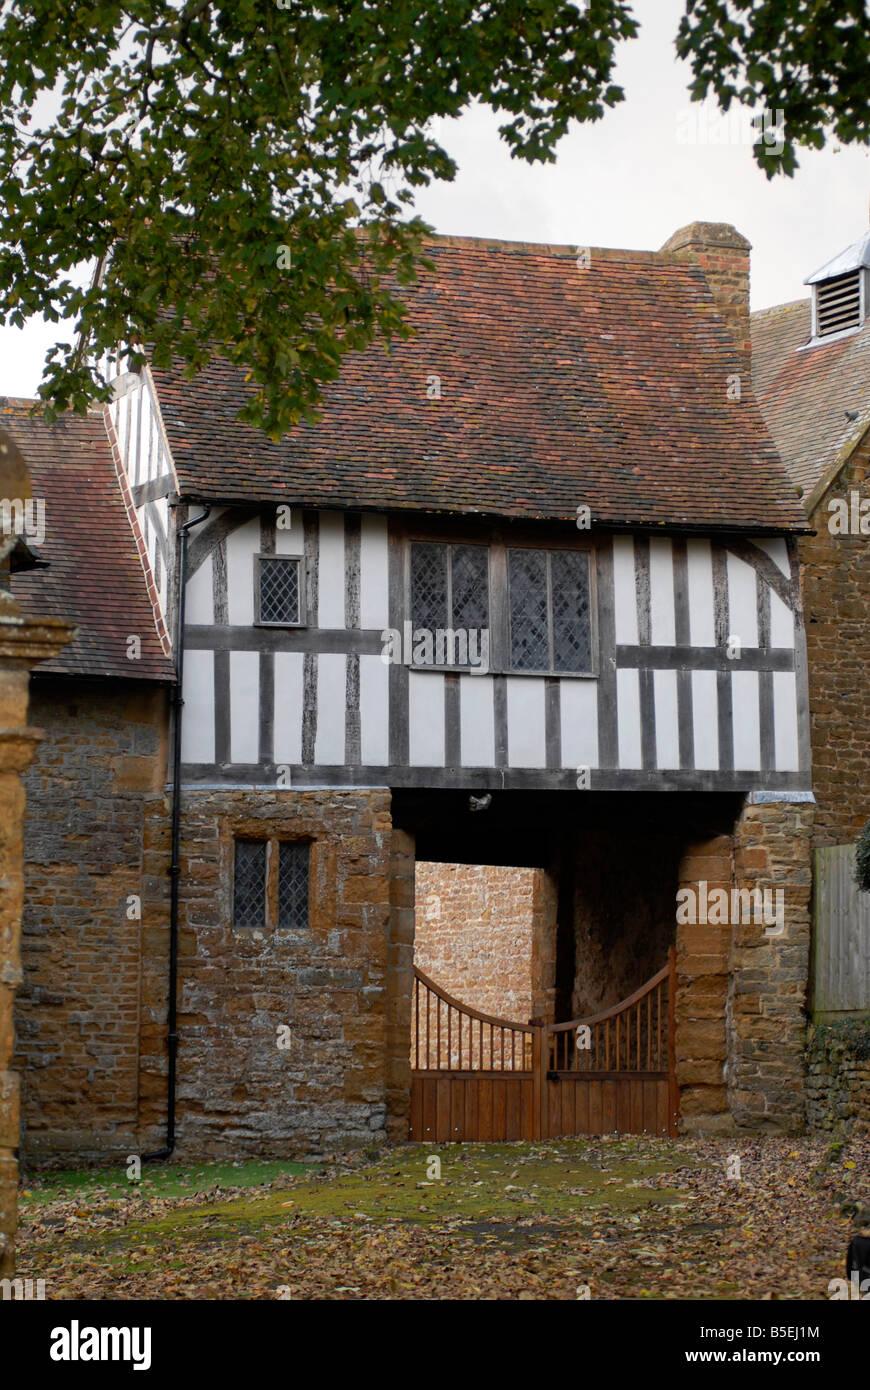 The Gunpowder Plot room above the Gatehouse at Ashby St Ledgers Manor, Northants., UK. - Stock Image